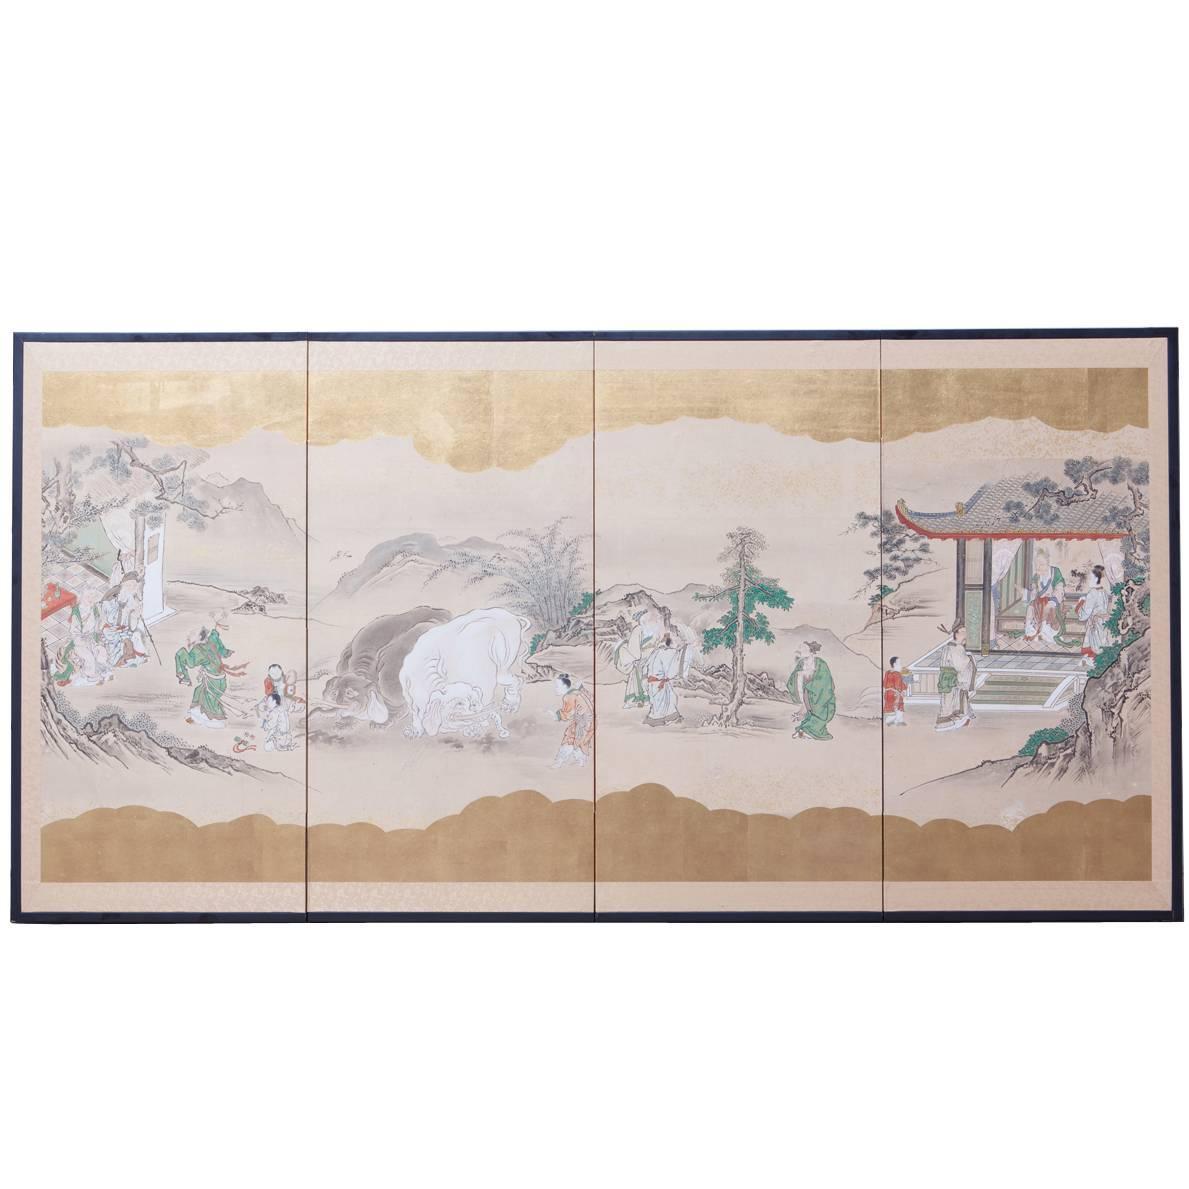 19th Century Japanese Four-Panel Kano School Edo Period Screen